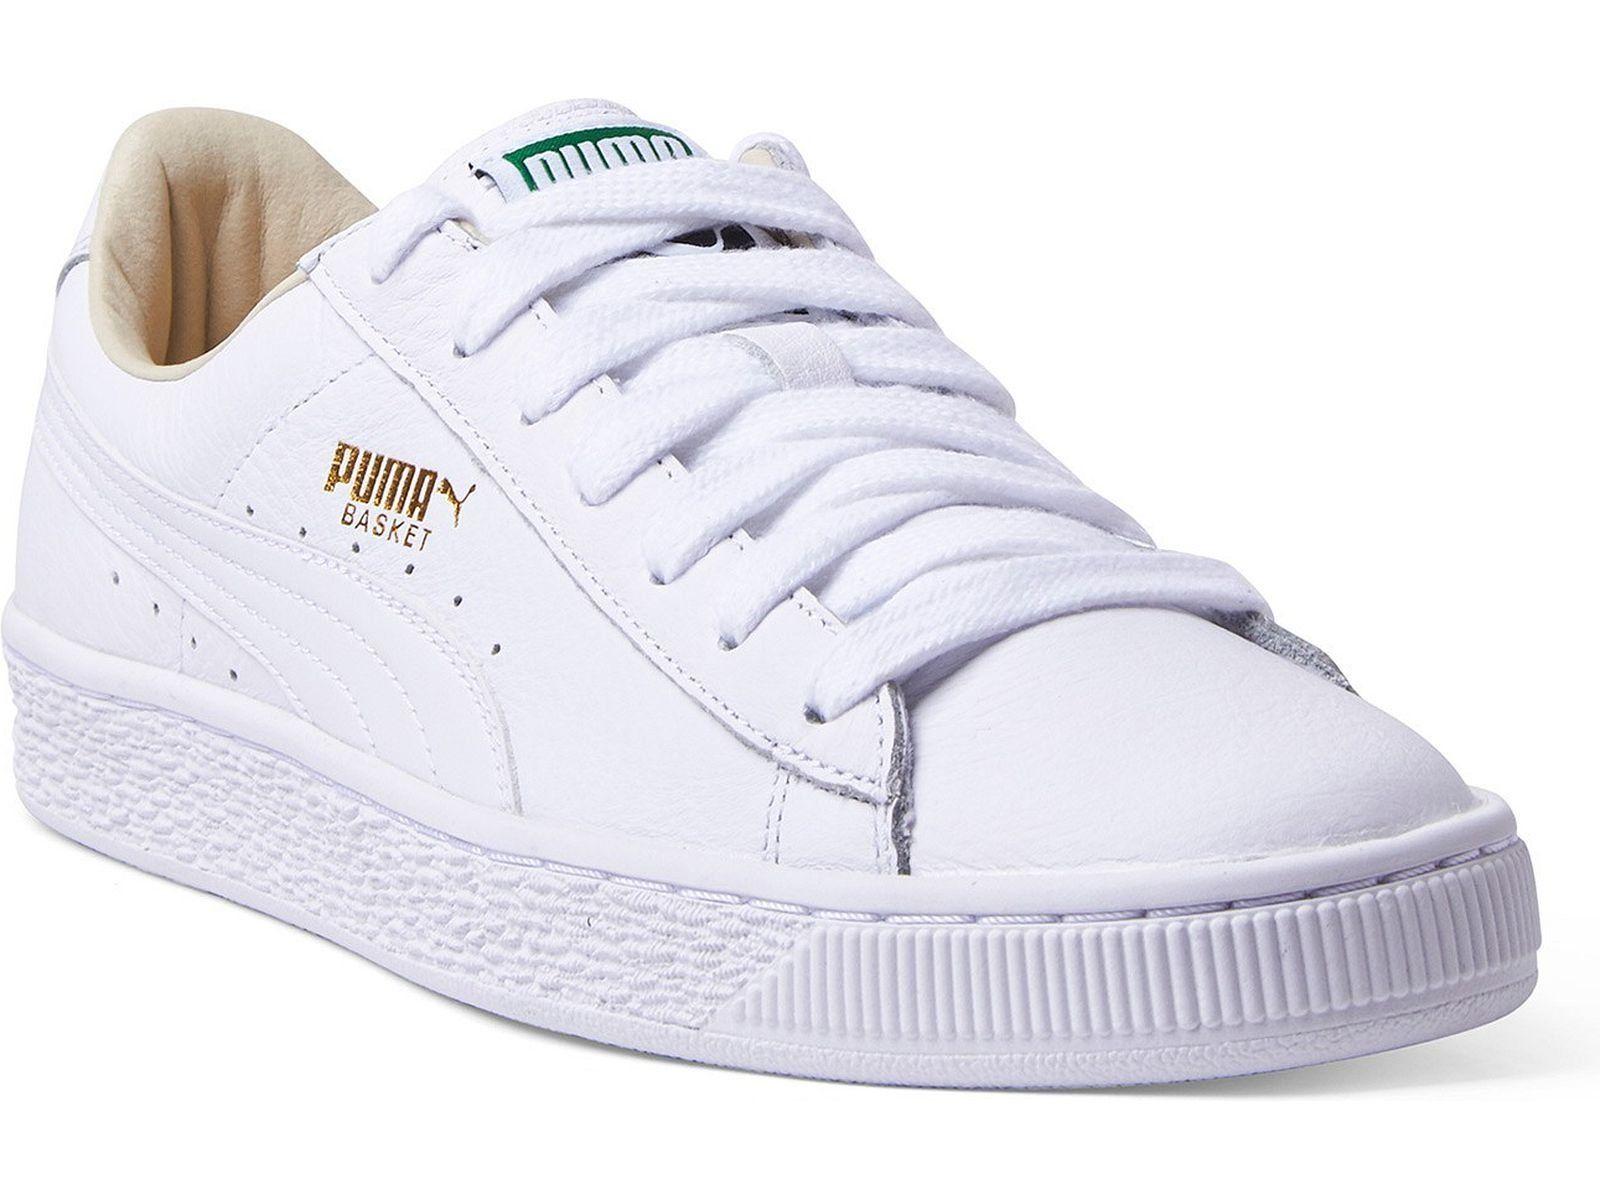 Puma Basket Classic LFS white Shoes - 354367-17 ...  c6624395a